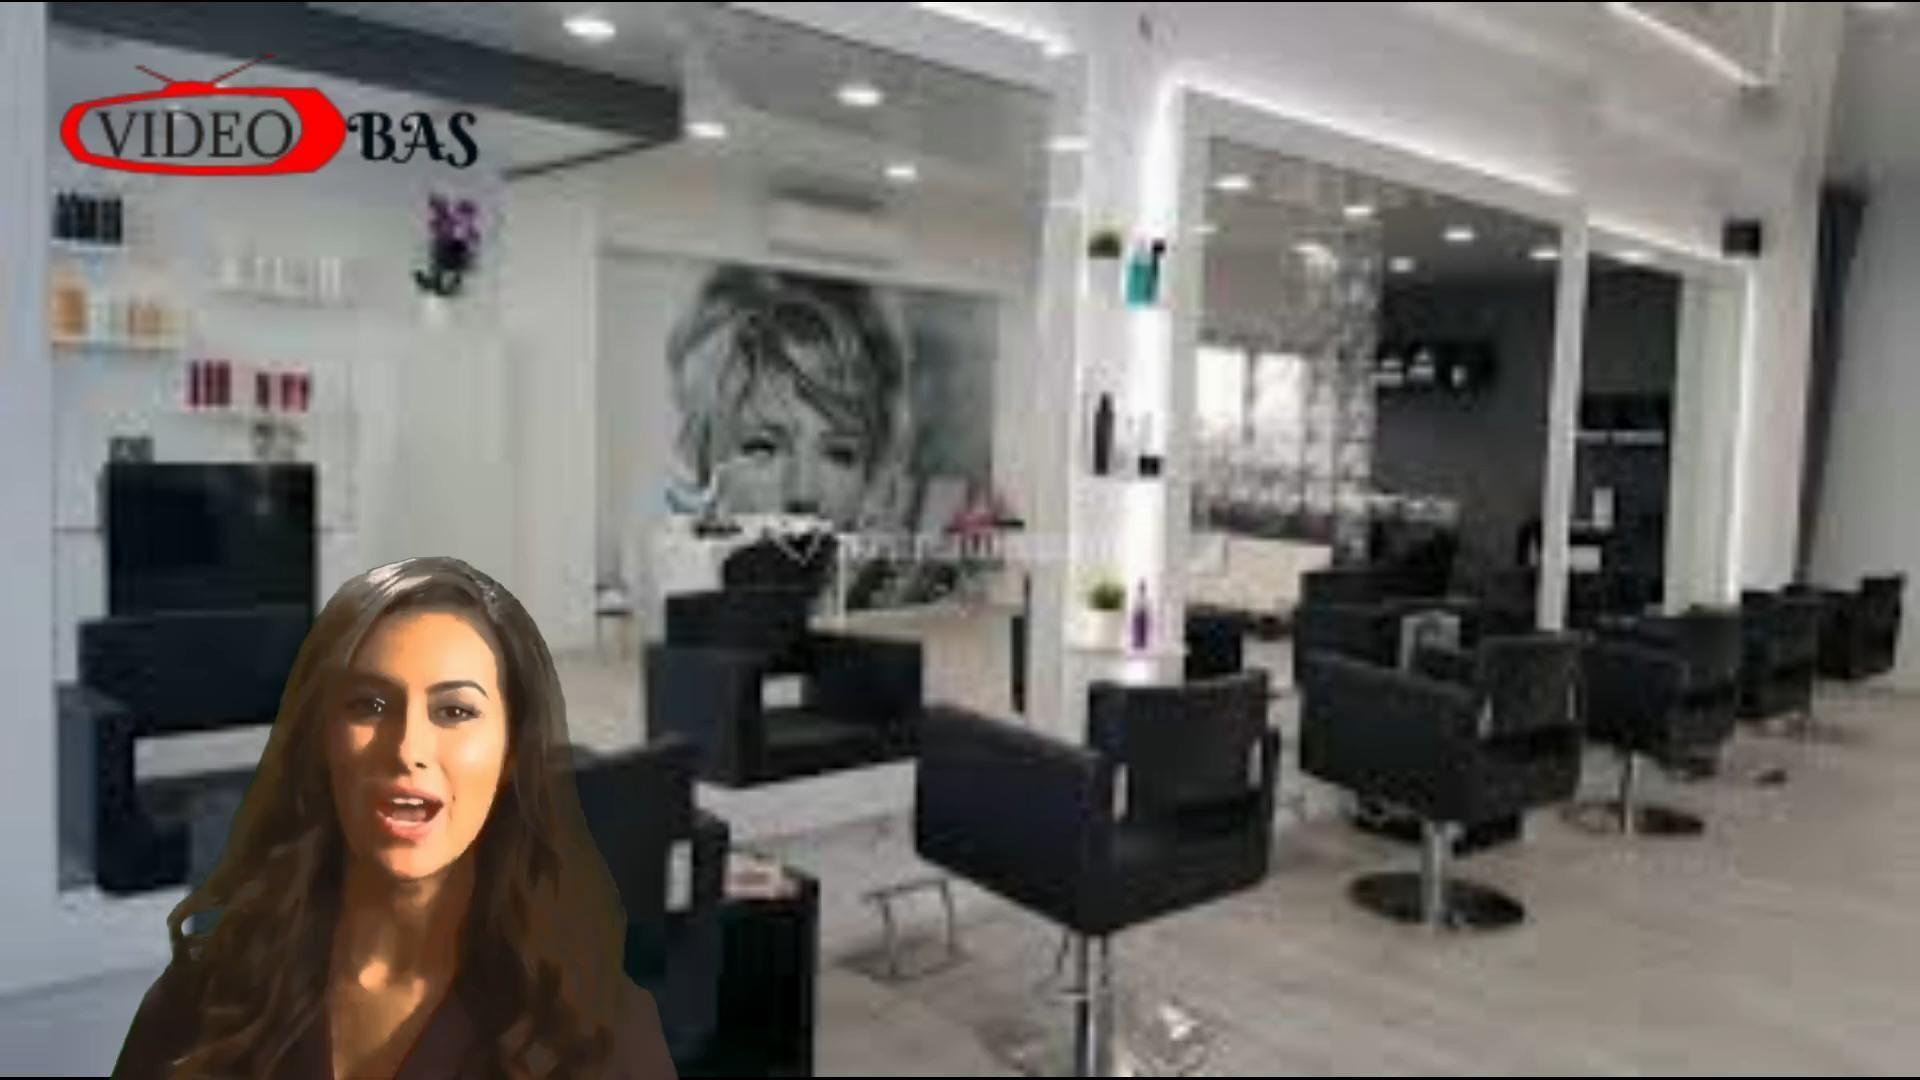 Hair Salon in Rome -   22 beauty Videos salon ideas